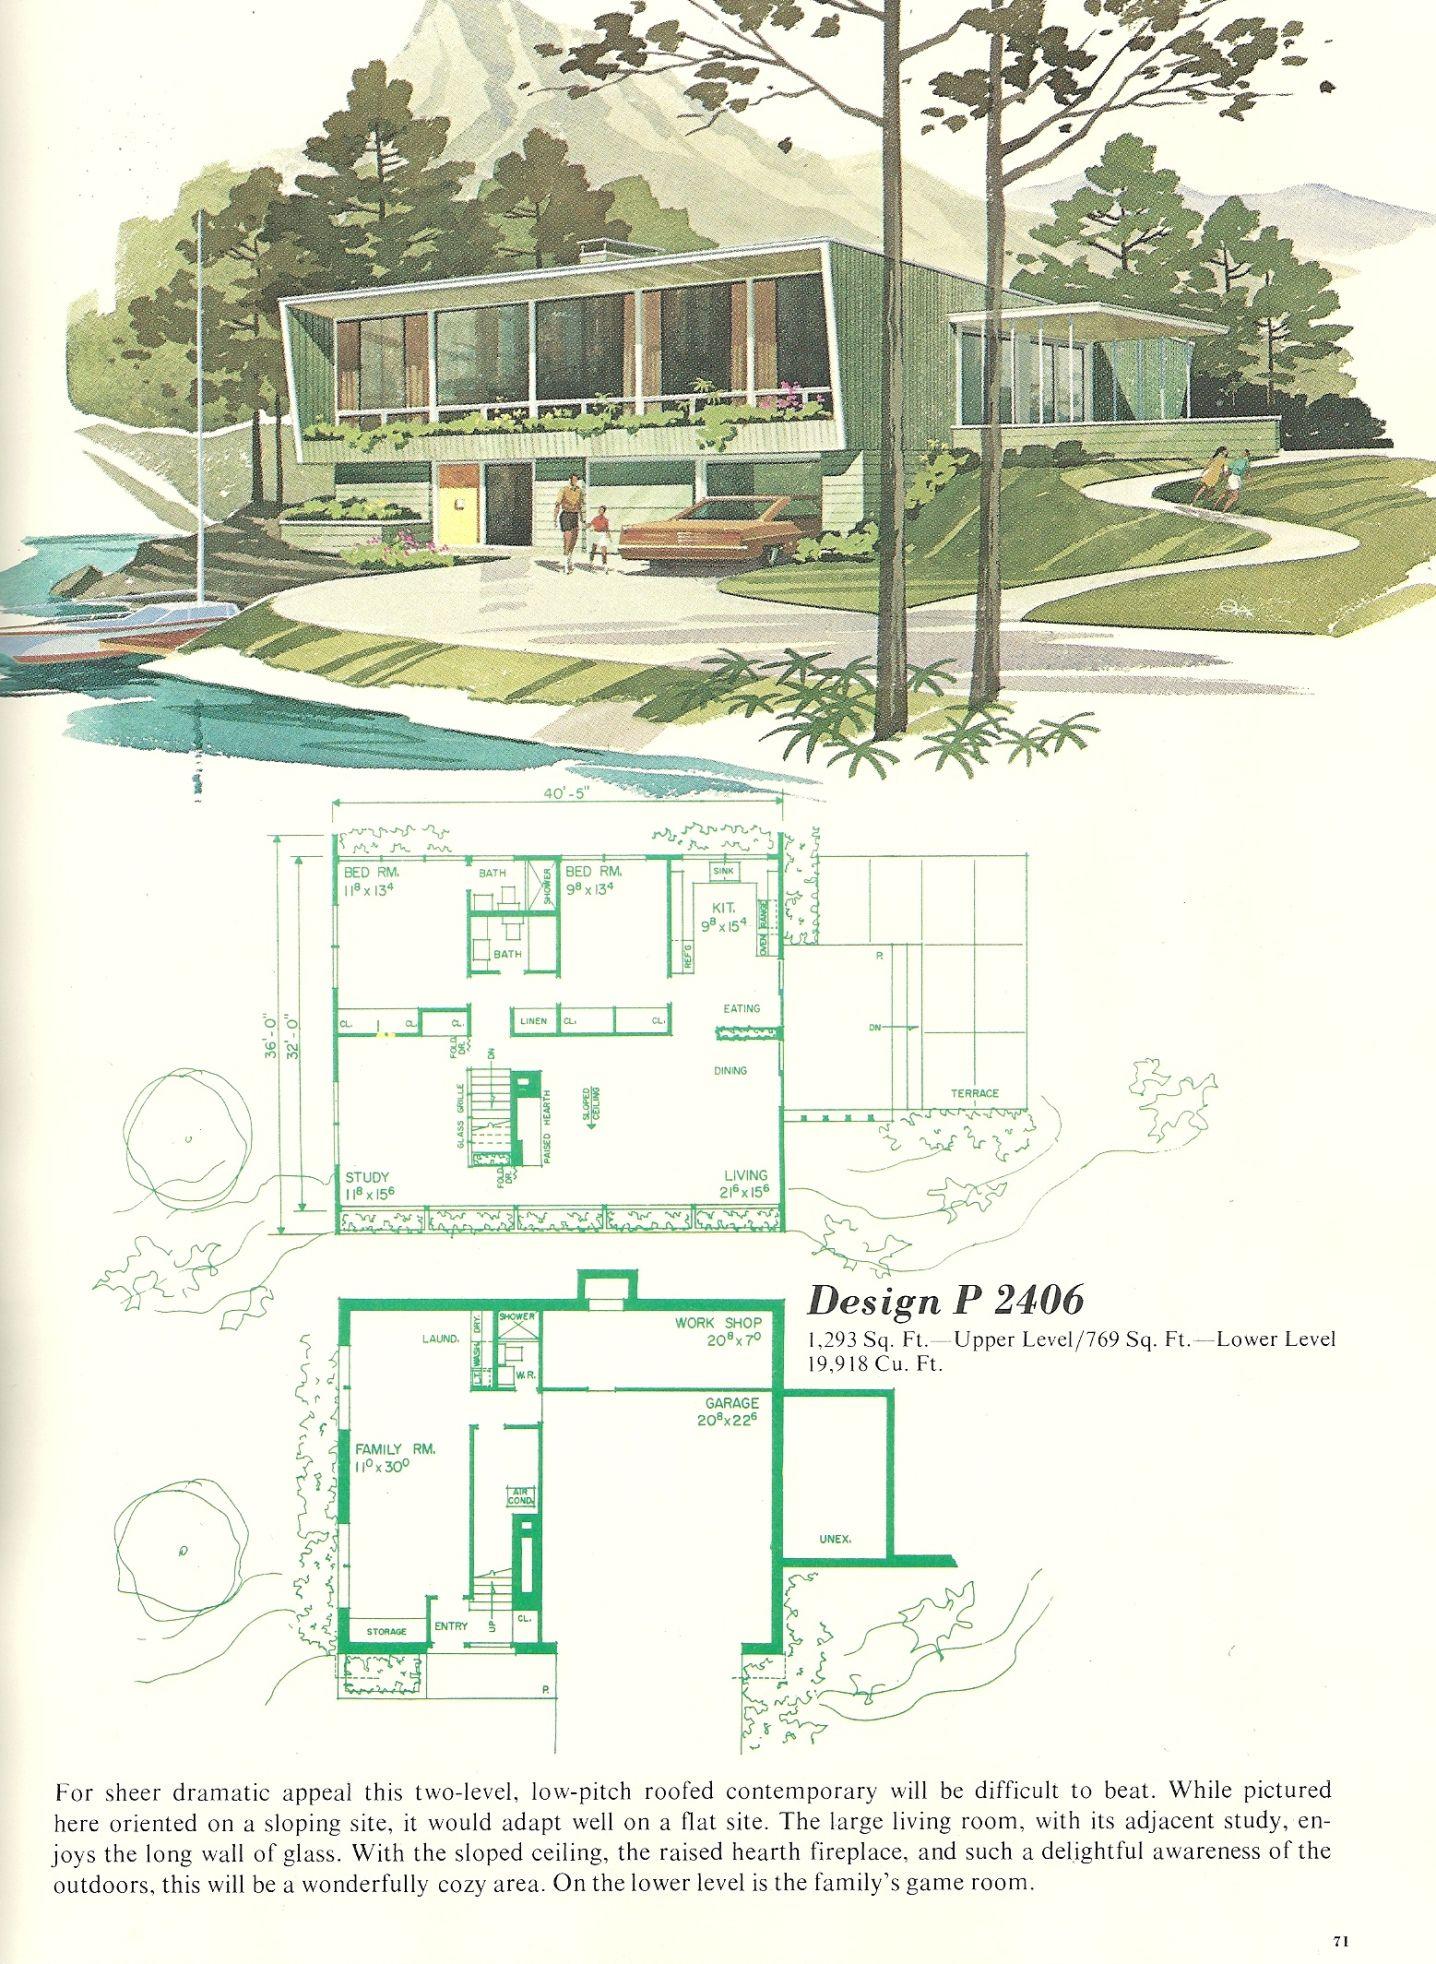 Vintage Vacation Homes 2406 Planos De Casas Diseno Casas Modernas Arquitectura